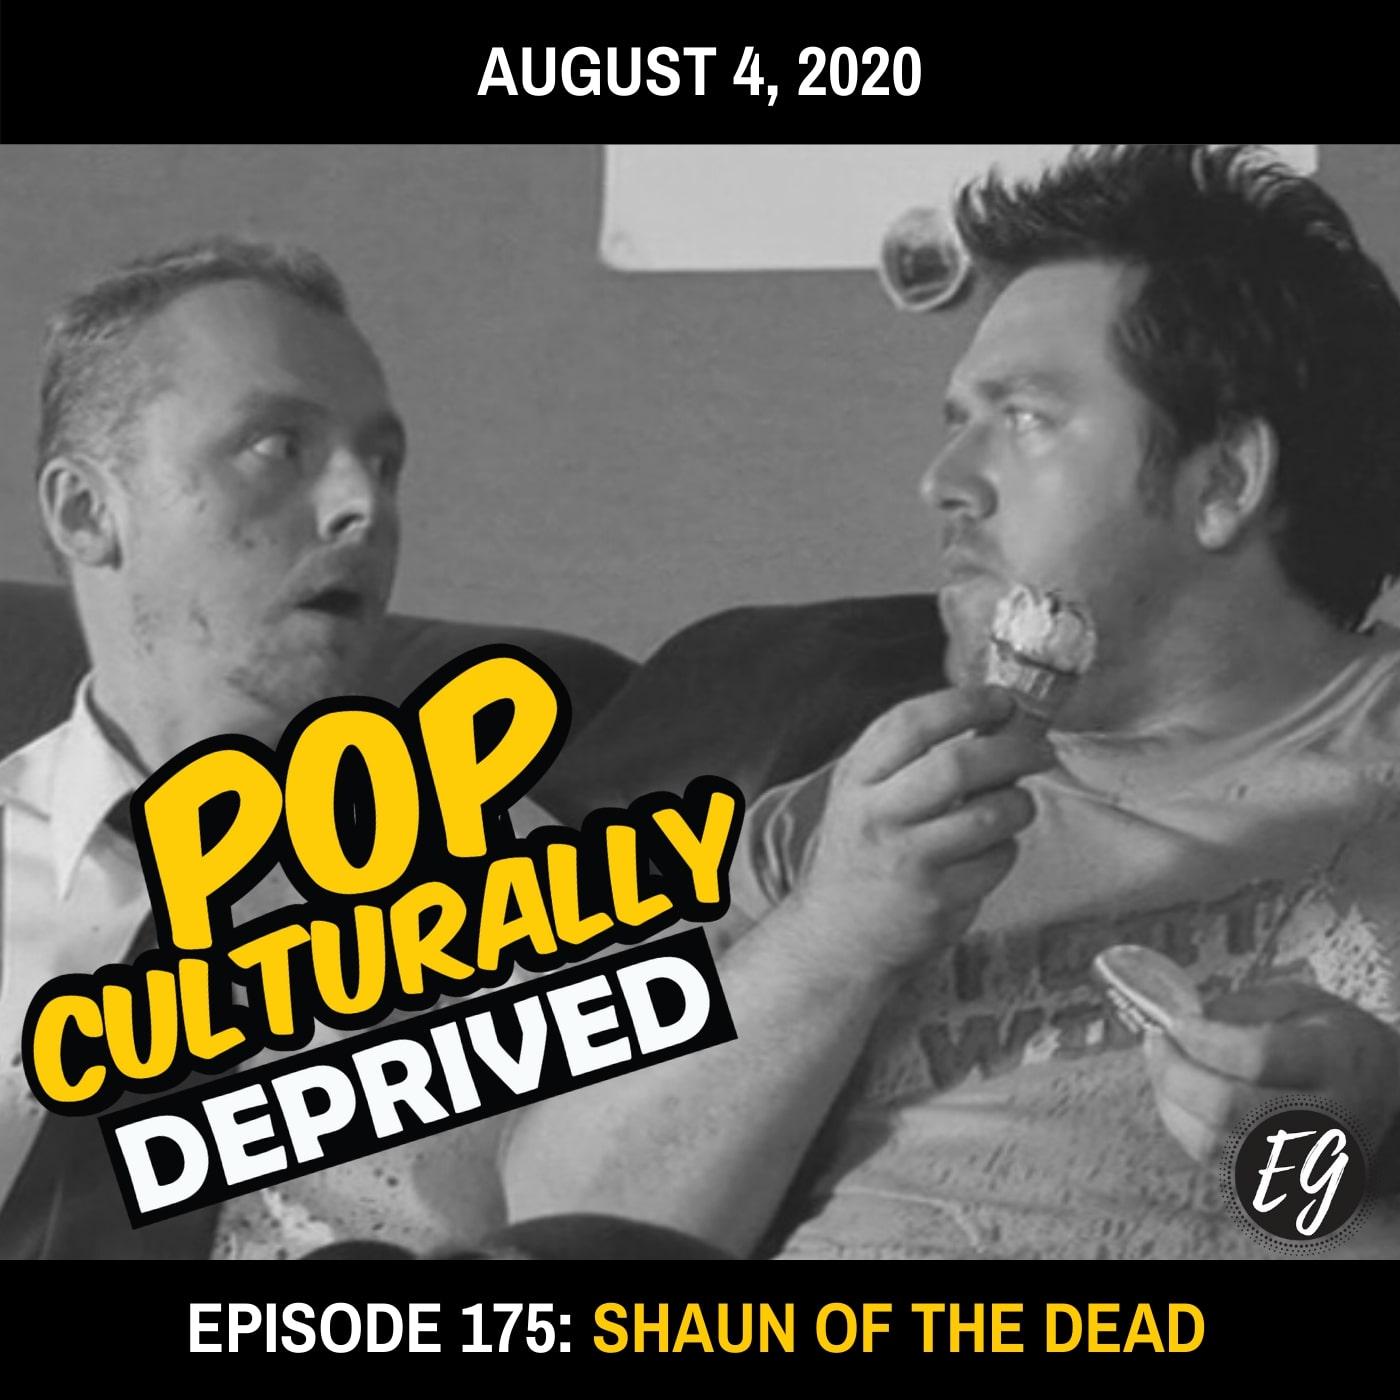 Episode 175: Shaun of the Dead